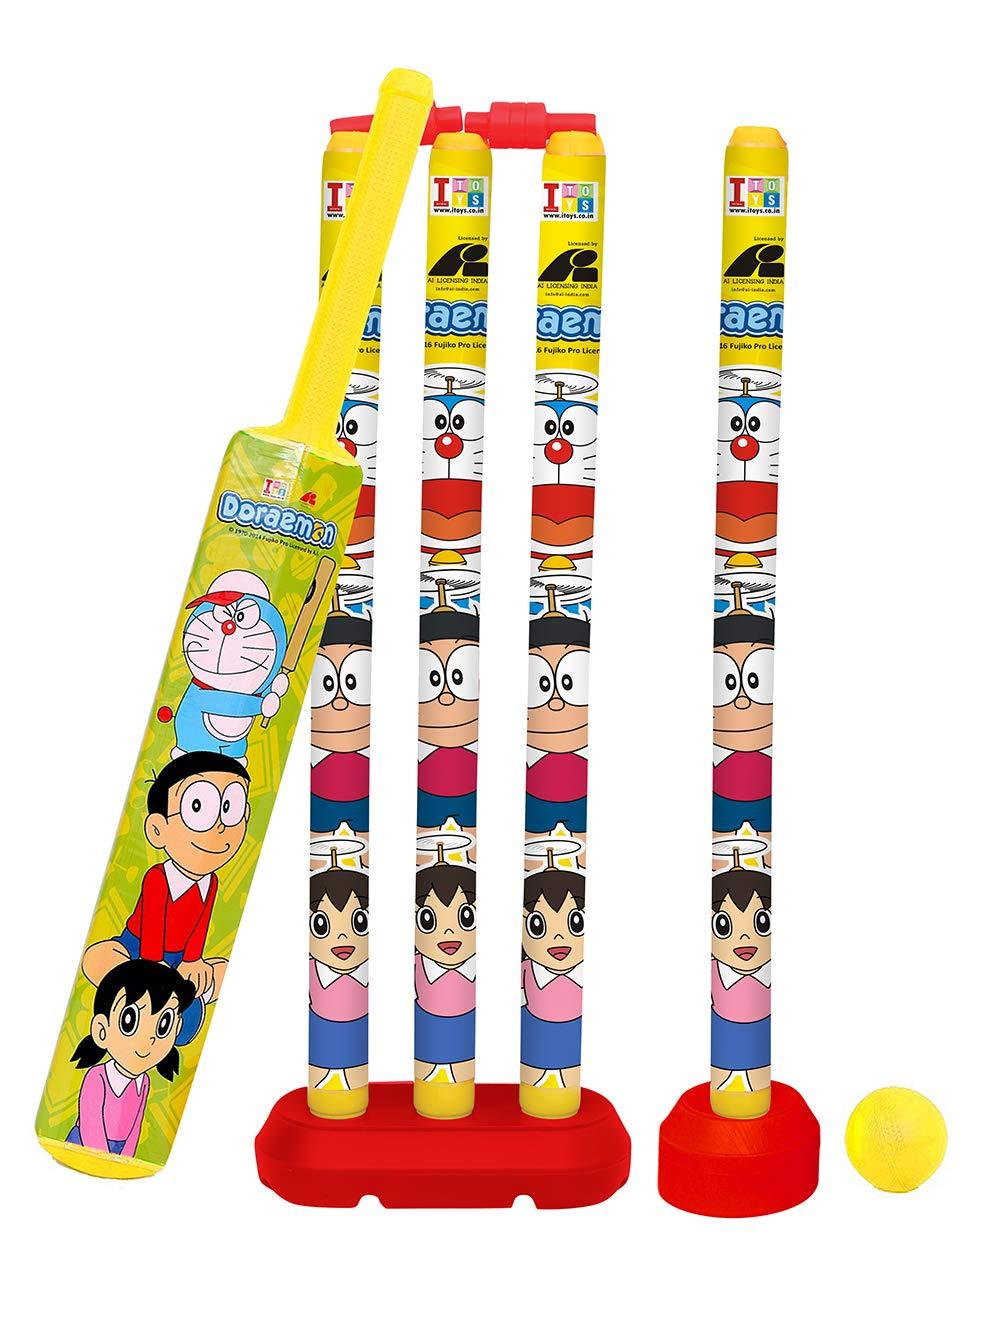 Doraemon Cricket Set with 4 Wickets